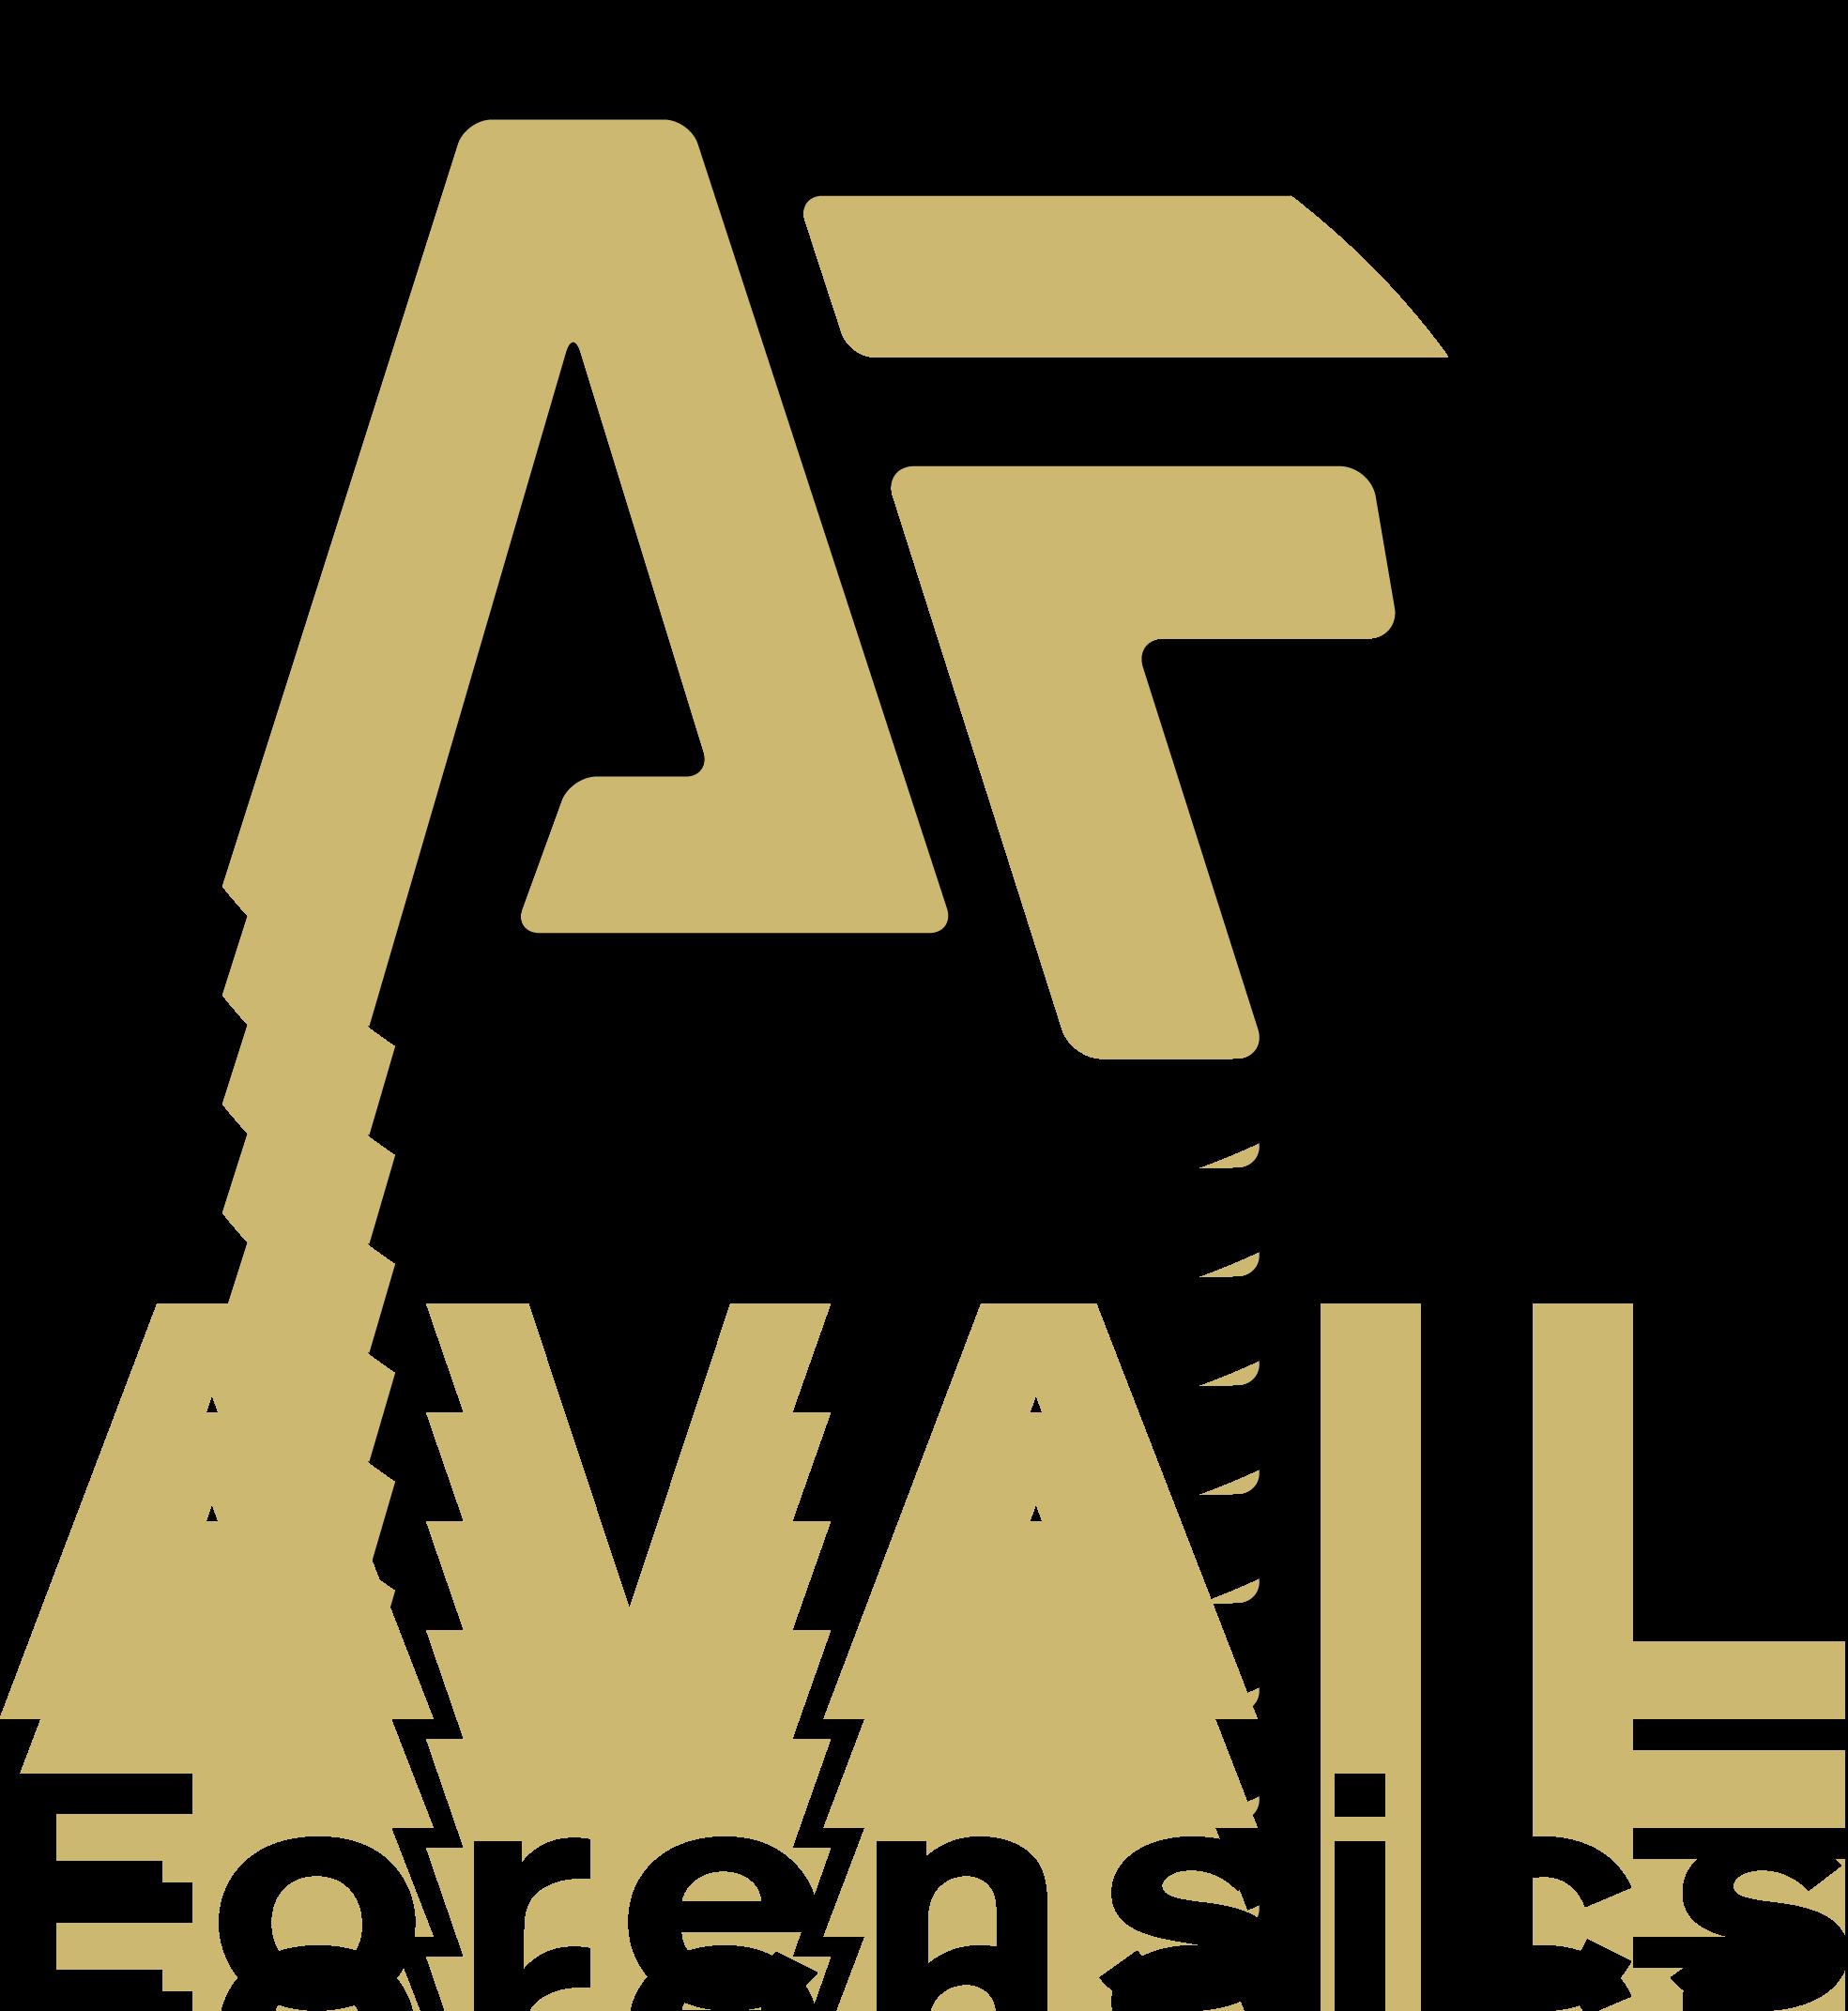 AVAIL Forensics (USA)